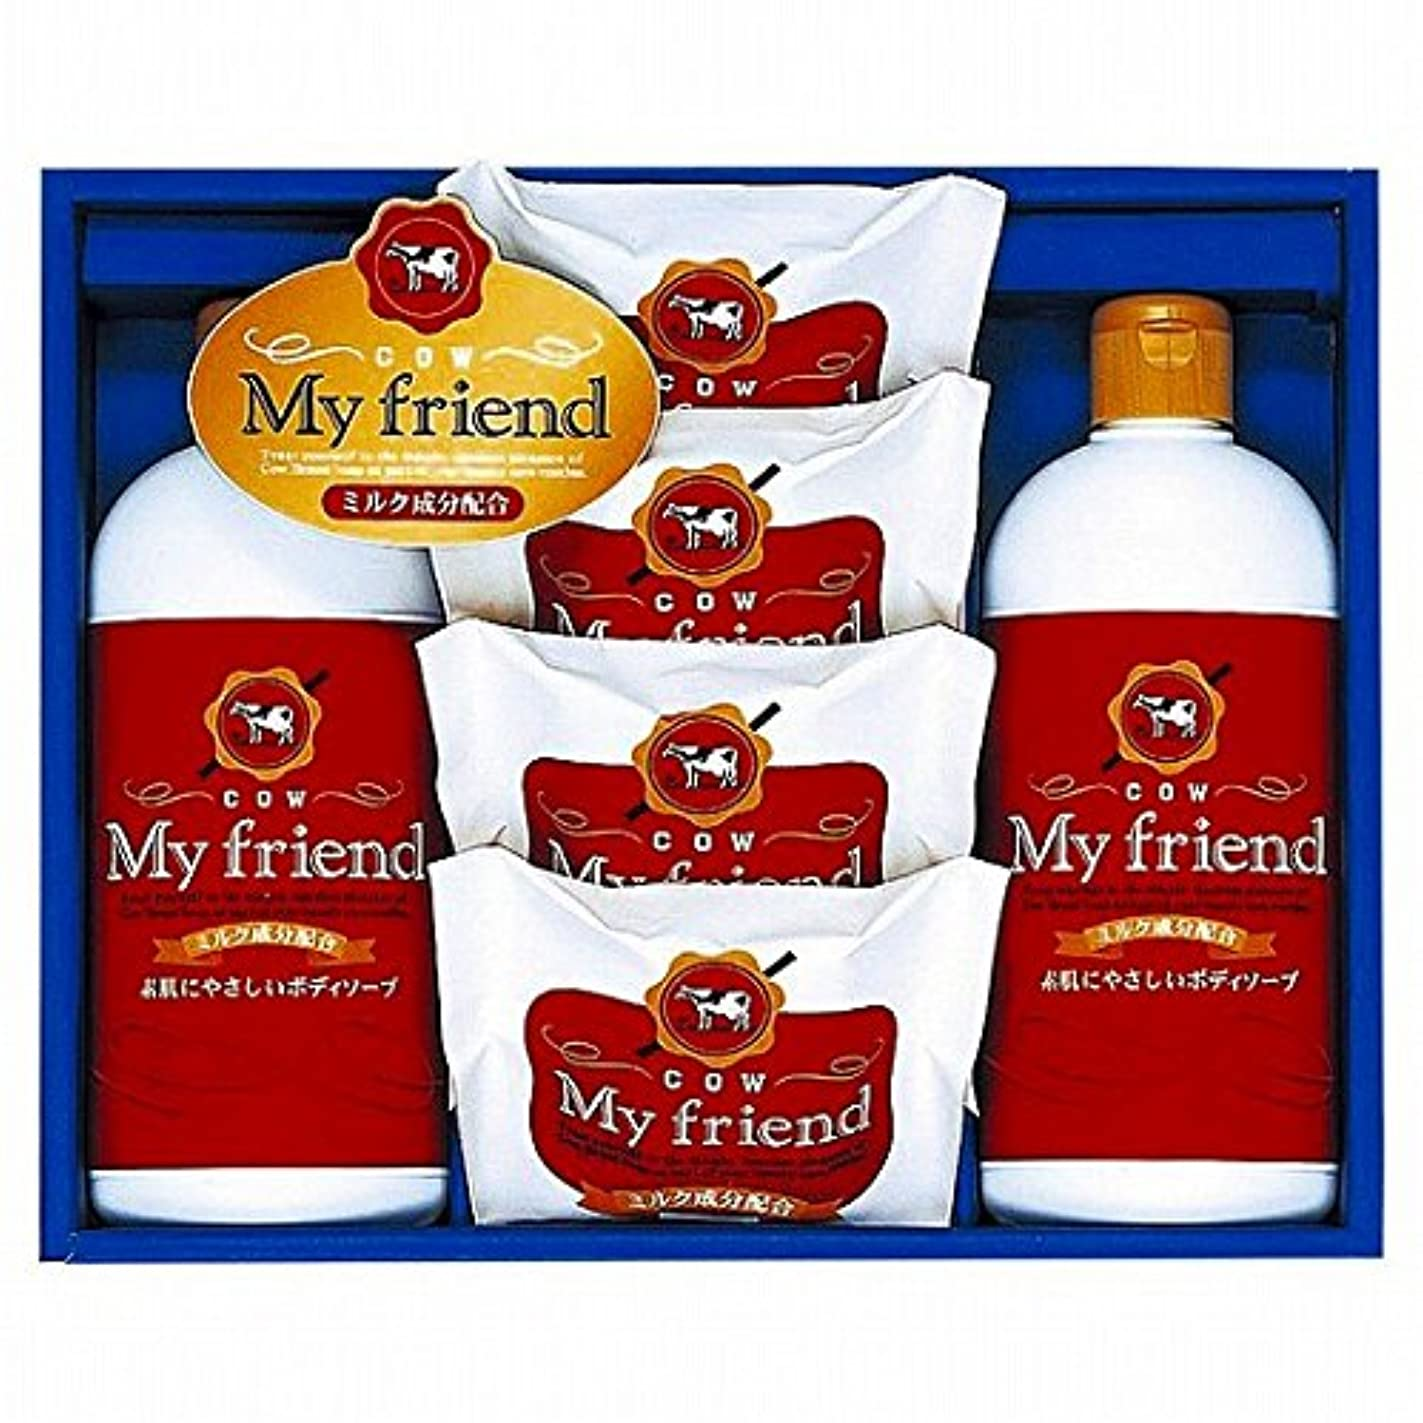 nobrand 牛乳石鹸 マイフレンドボディソープセット (21940008)